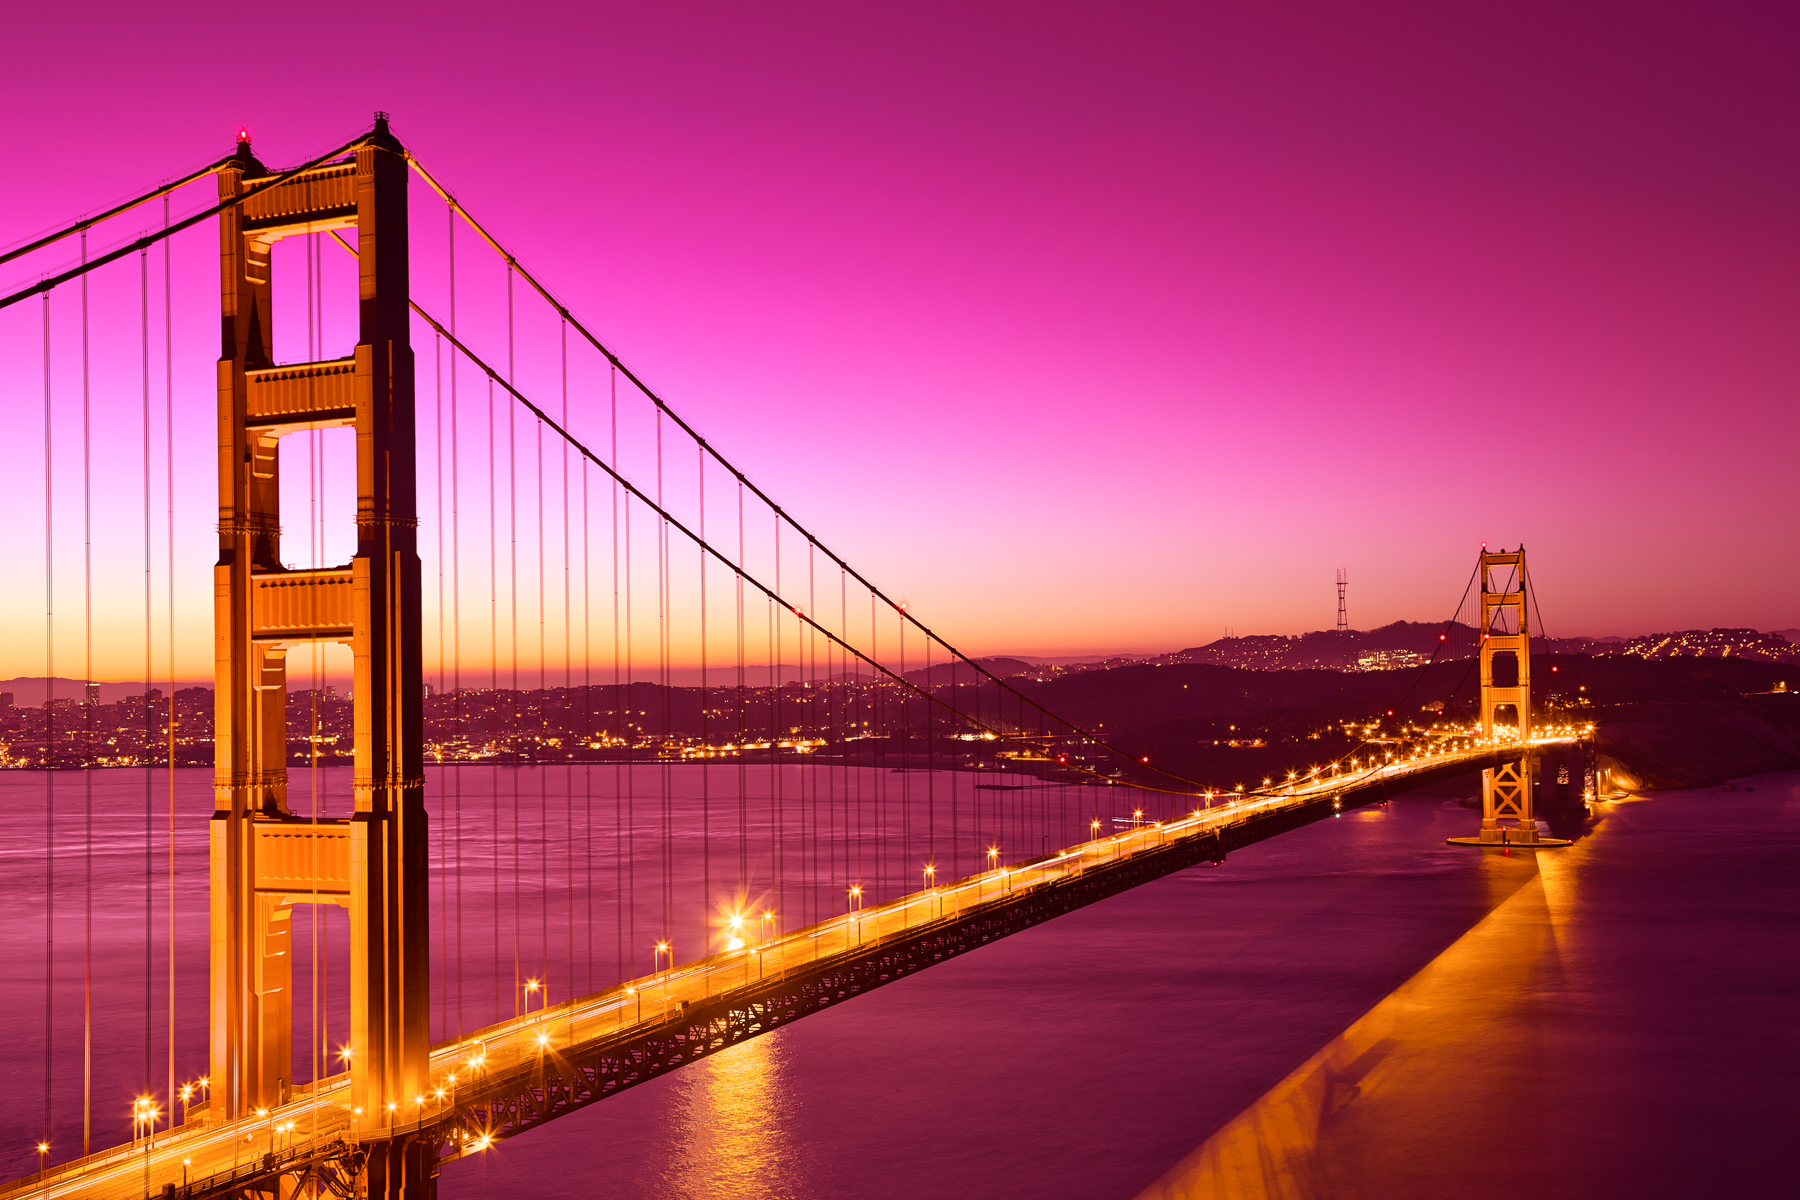 Golden love bridge - hdr photo